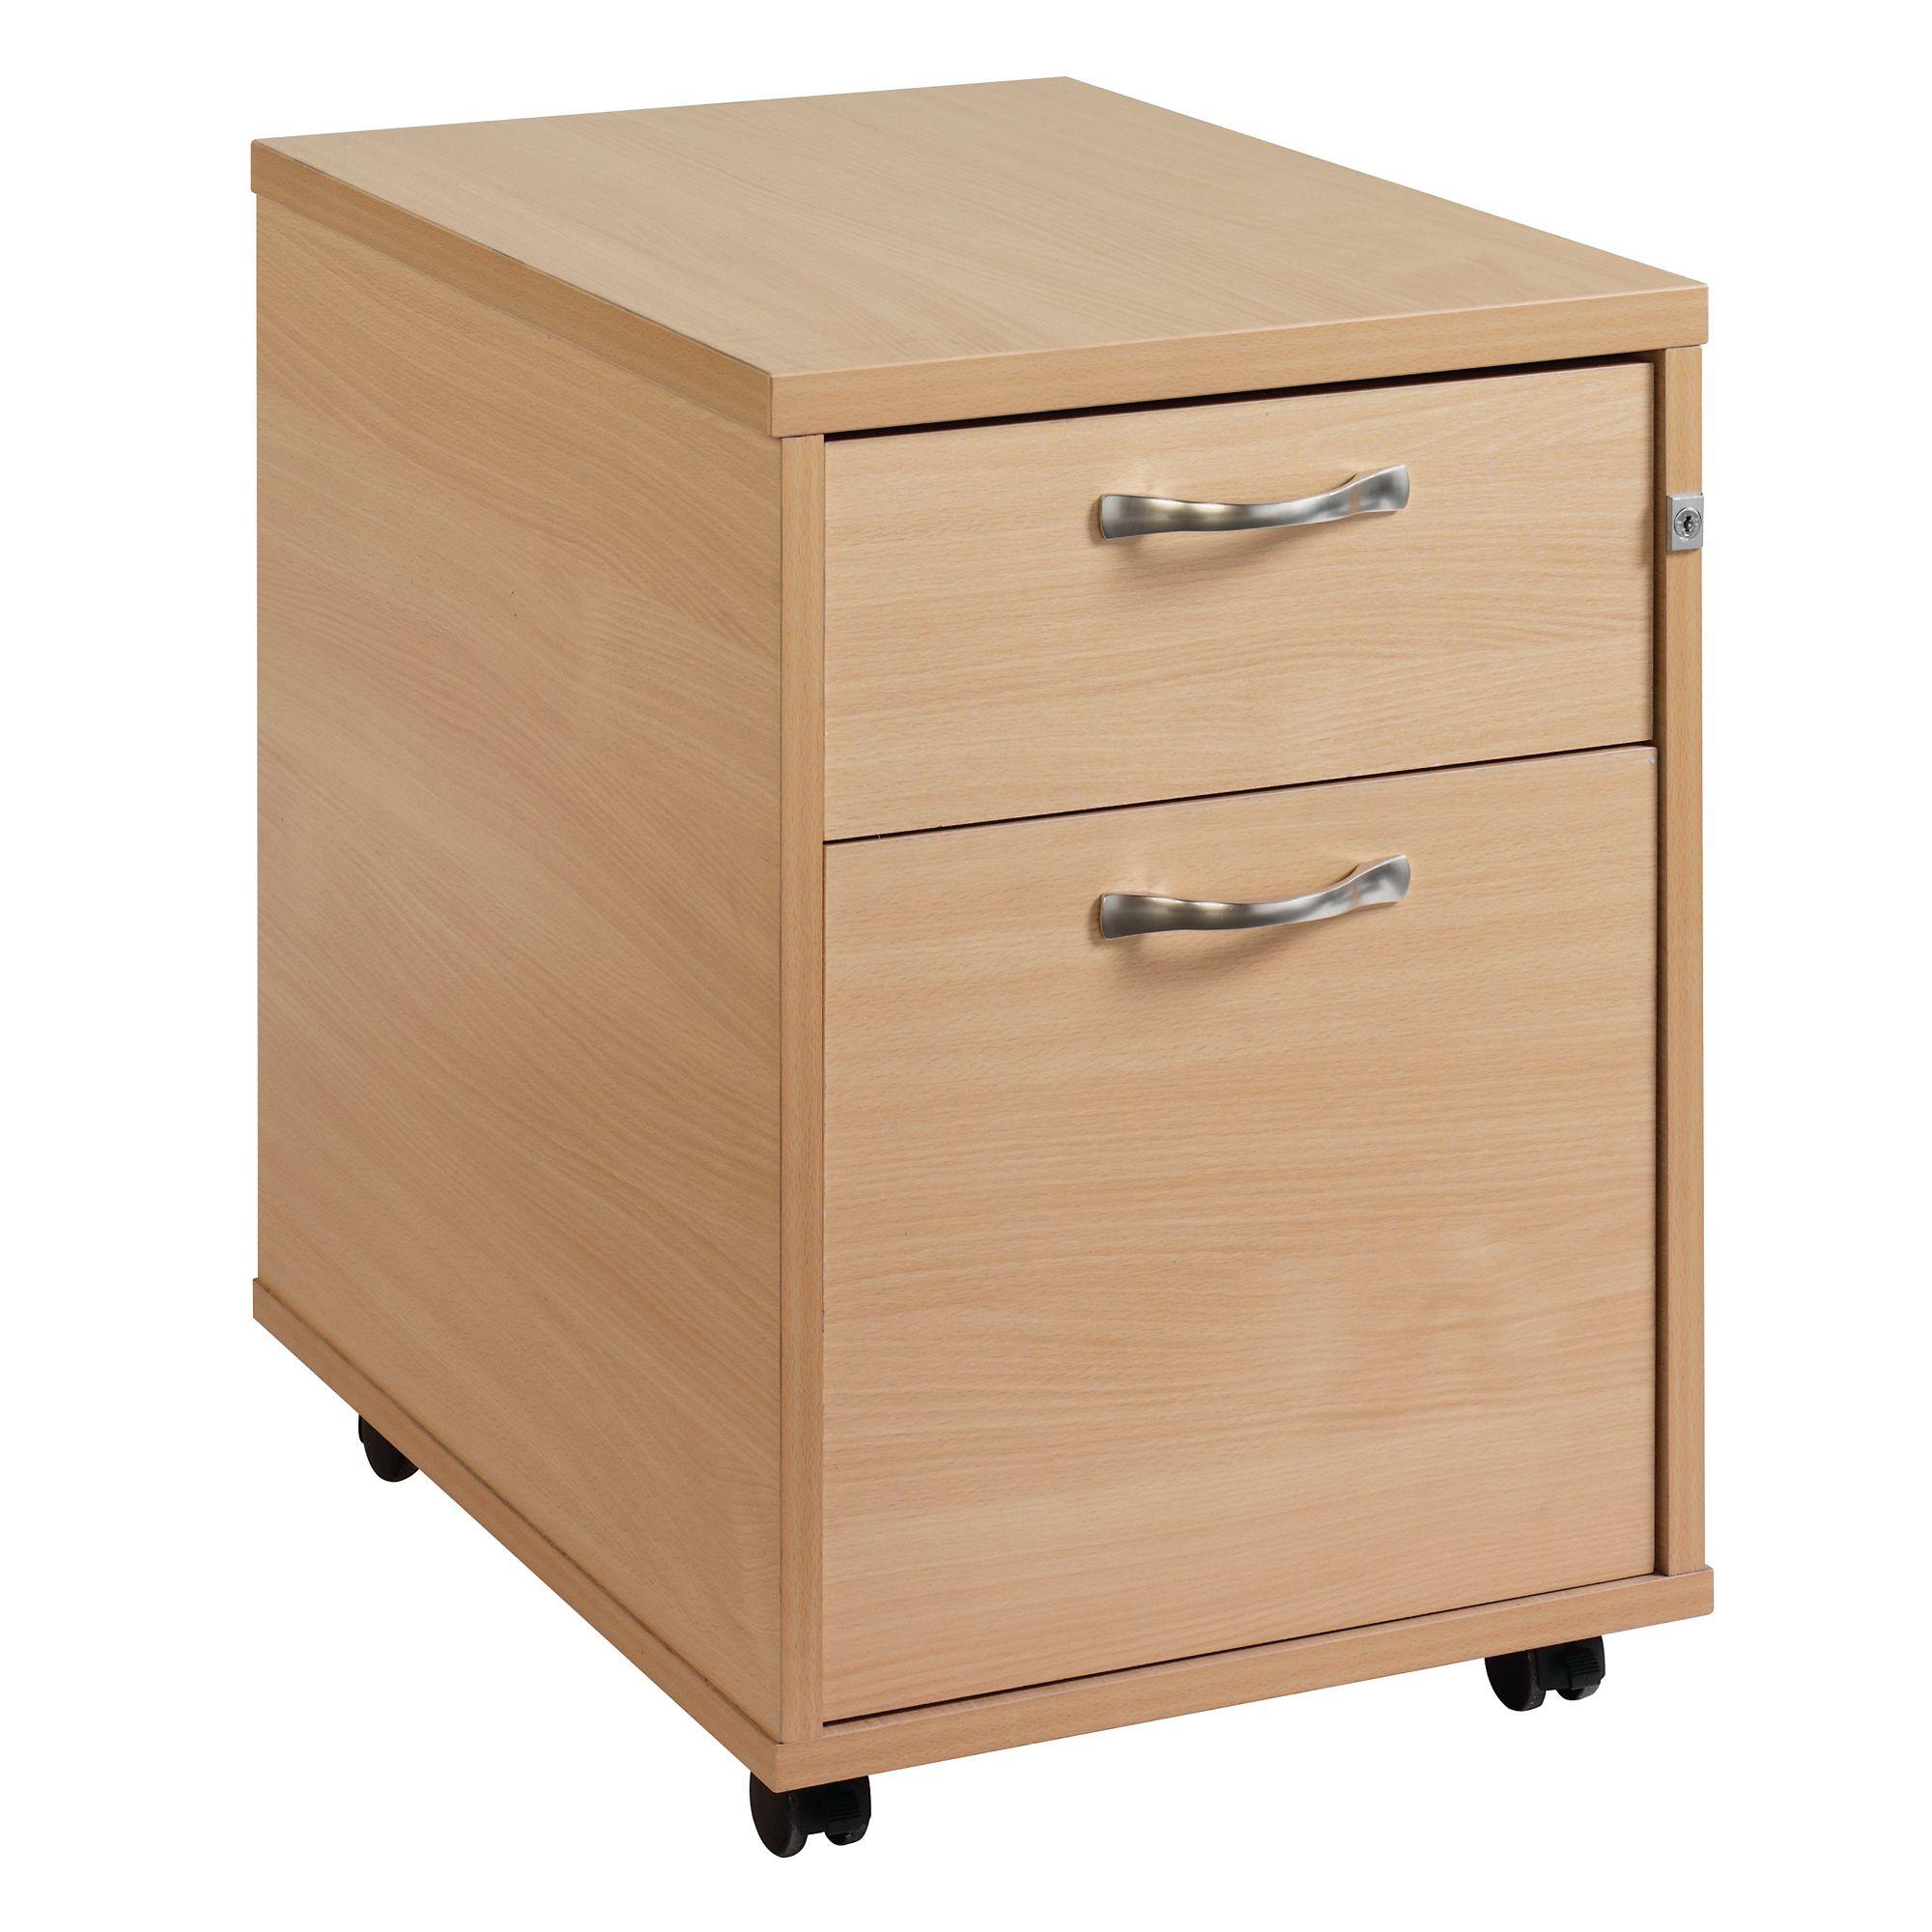 2 Draw Mobile Pedestal Maple